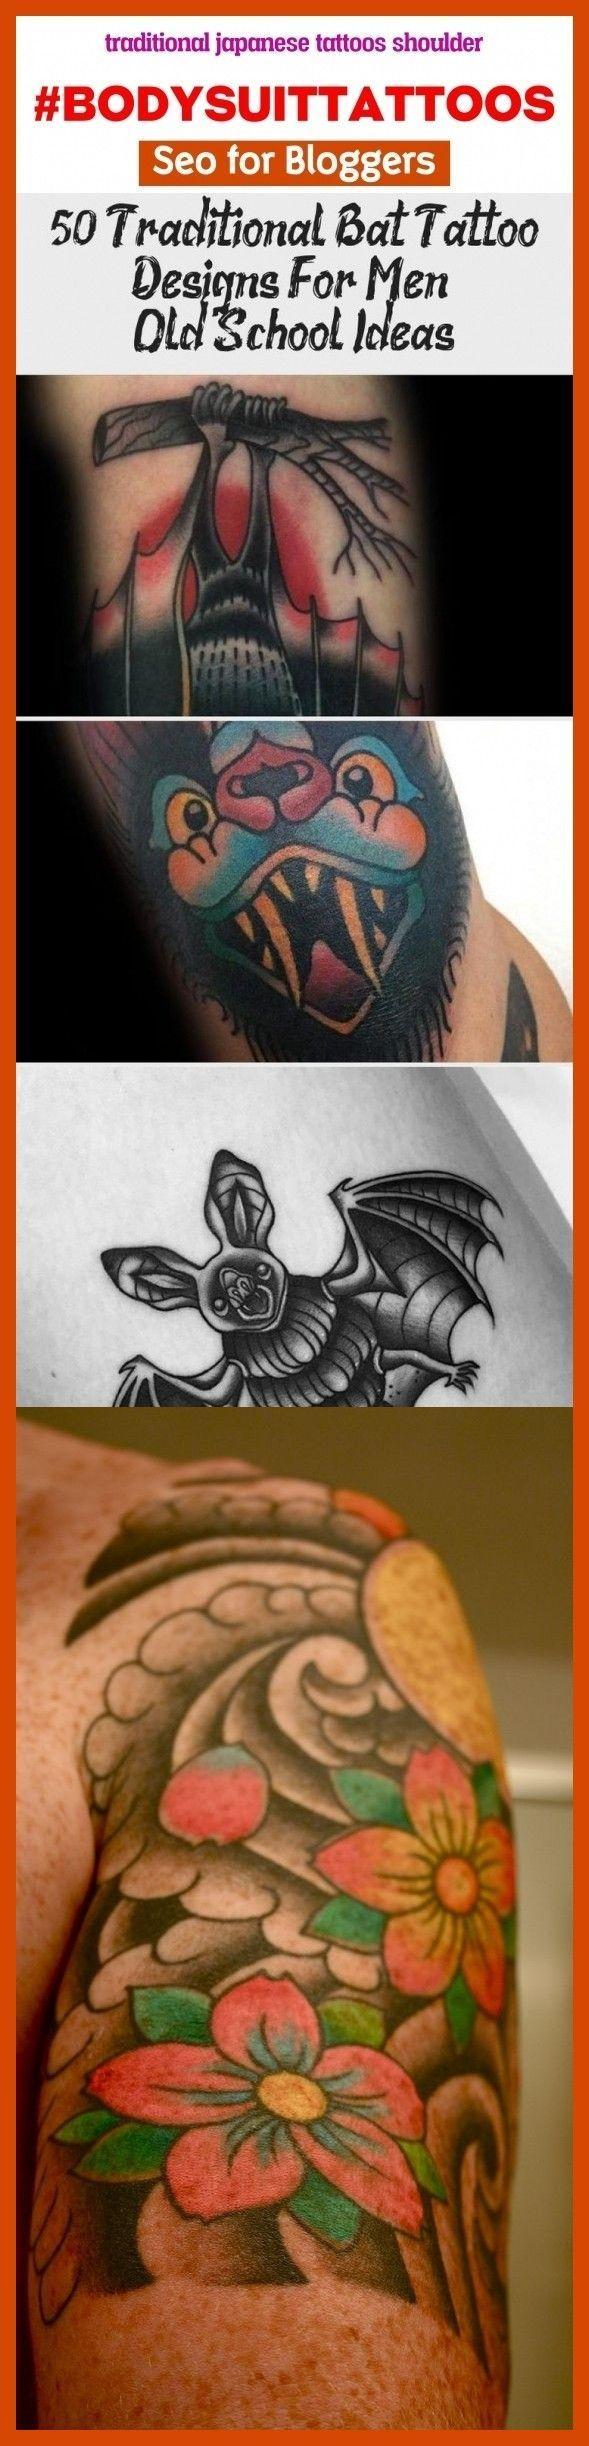 Traditional japanese tattoos shoulder